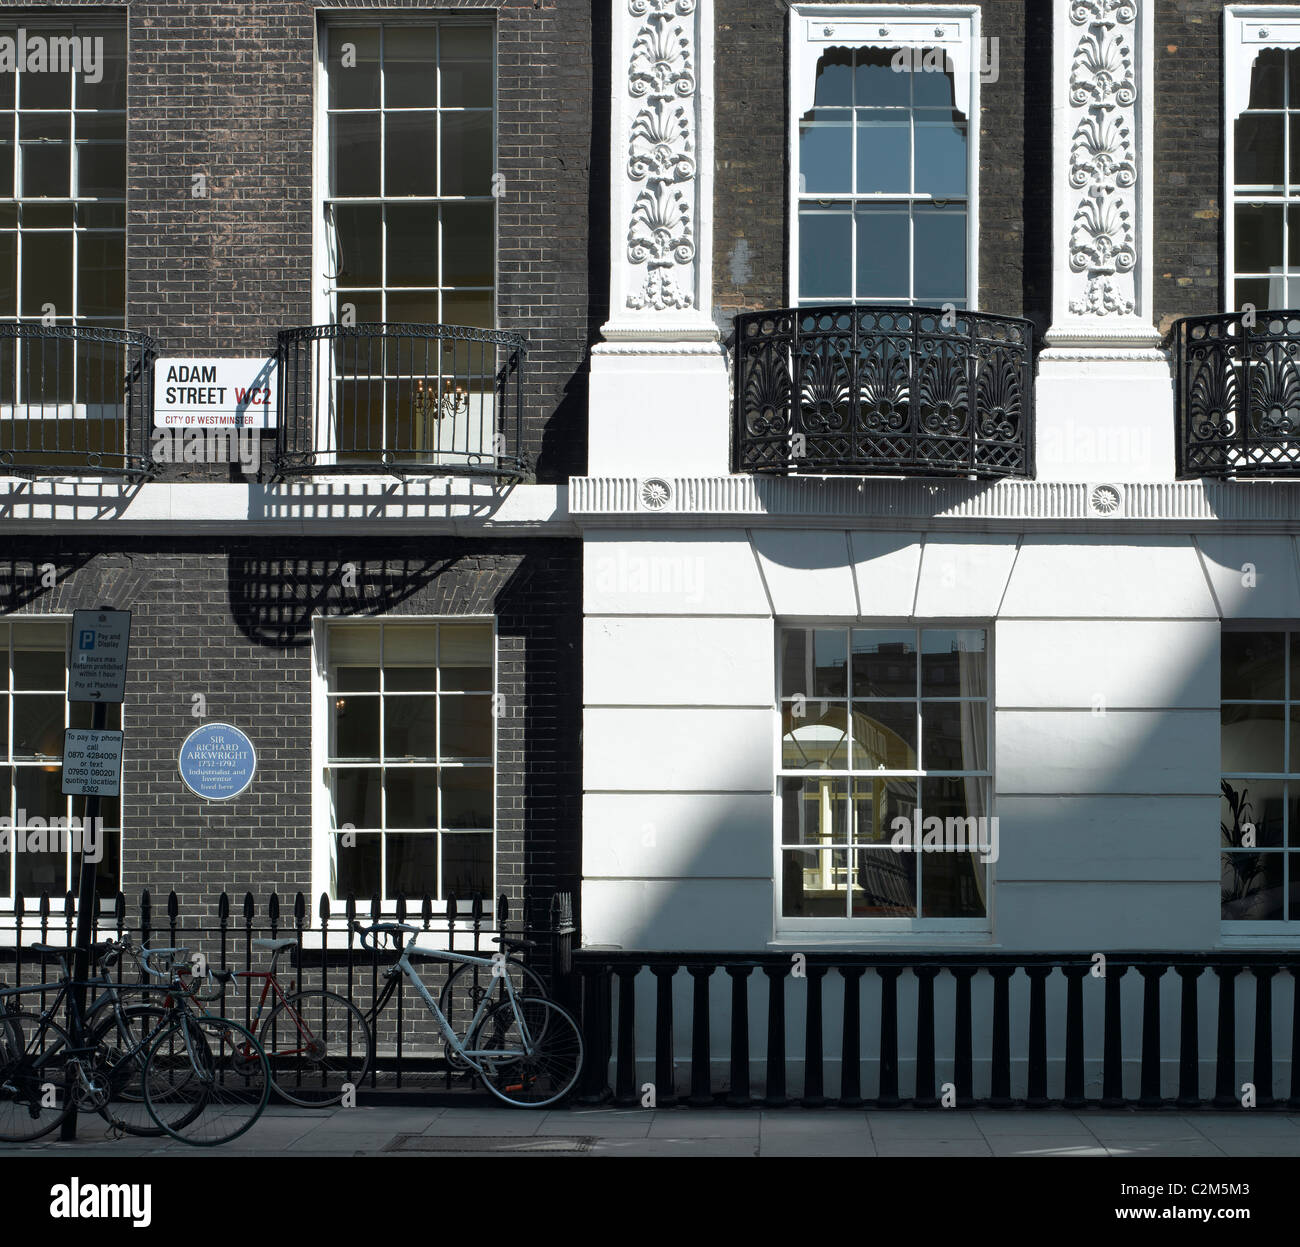 Adam Street, London. - Stock Image